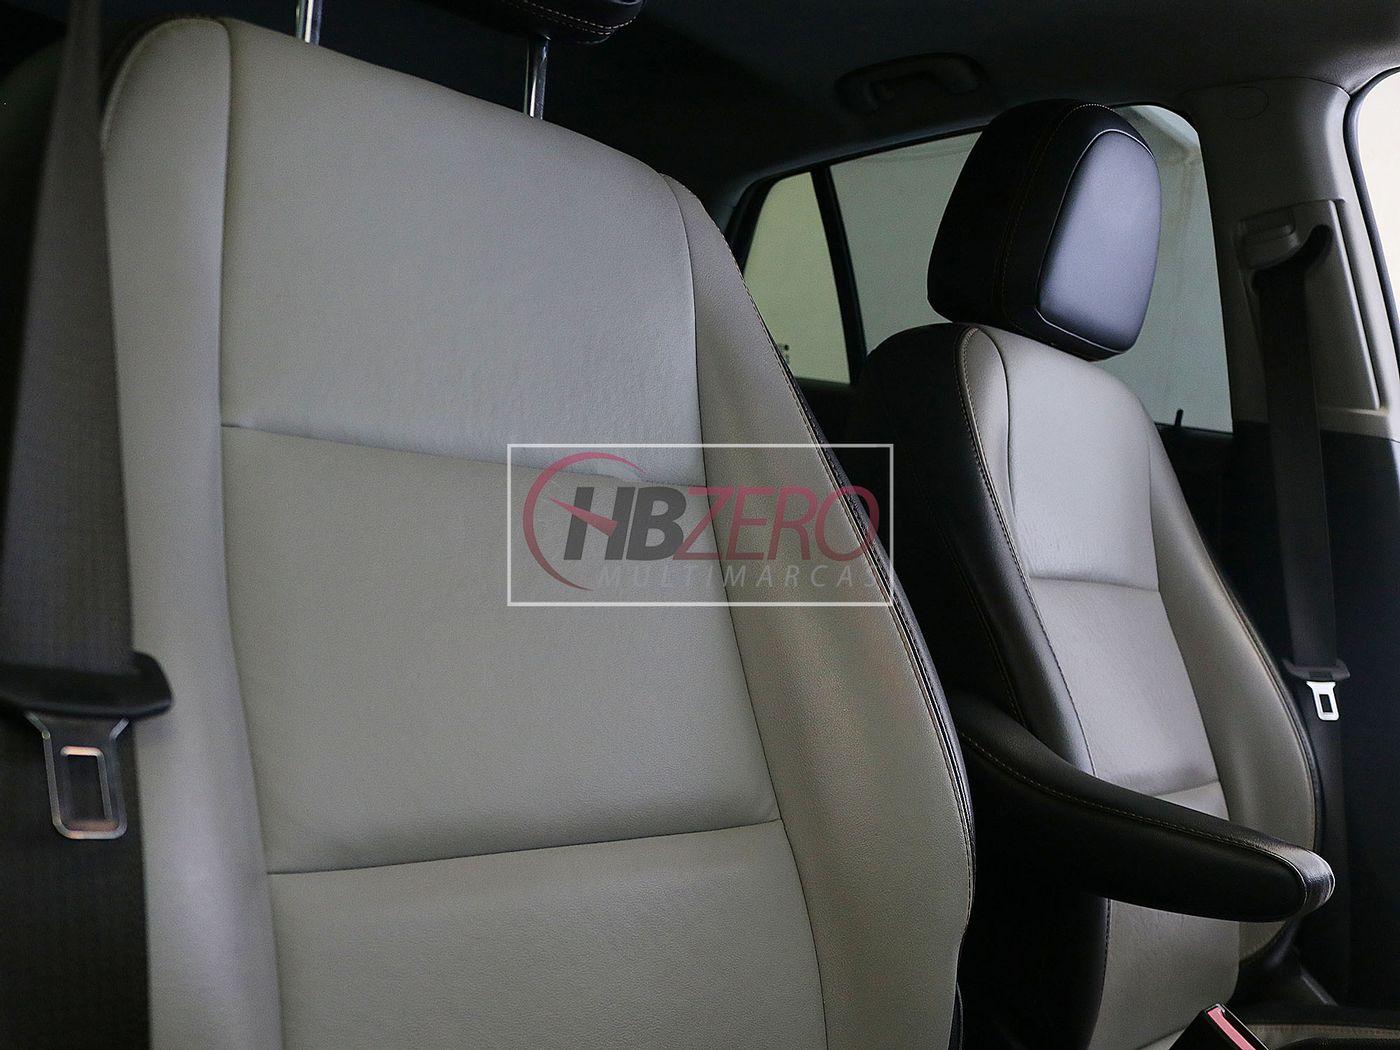 Chevrolet TRACKER LTZ 1.4 Turbo 16V Flex 4x2 Aut.